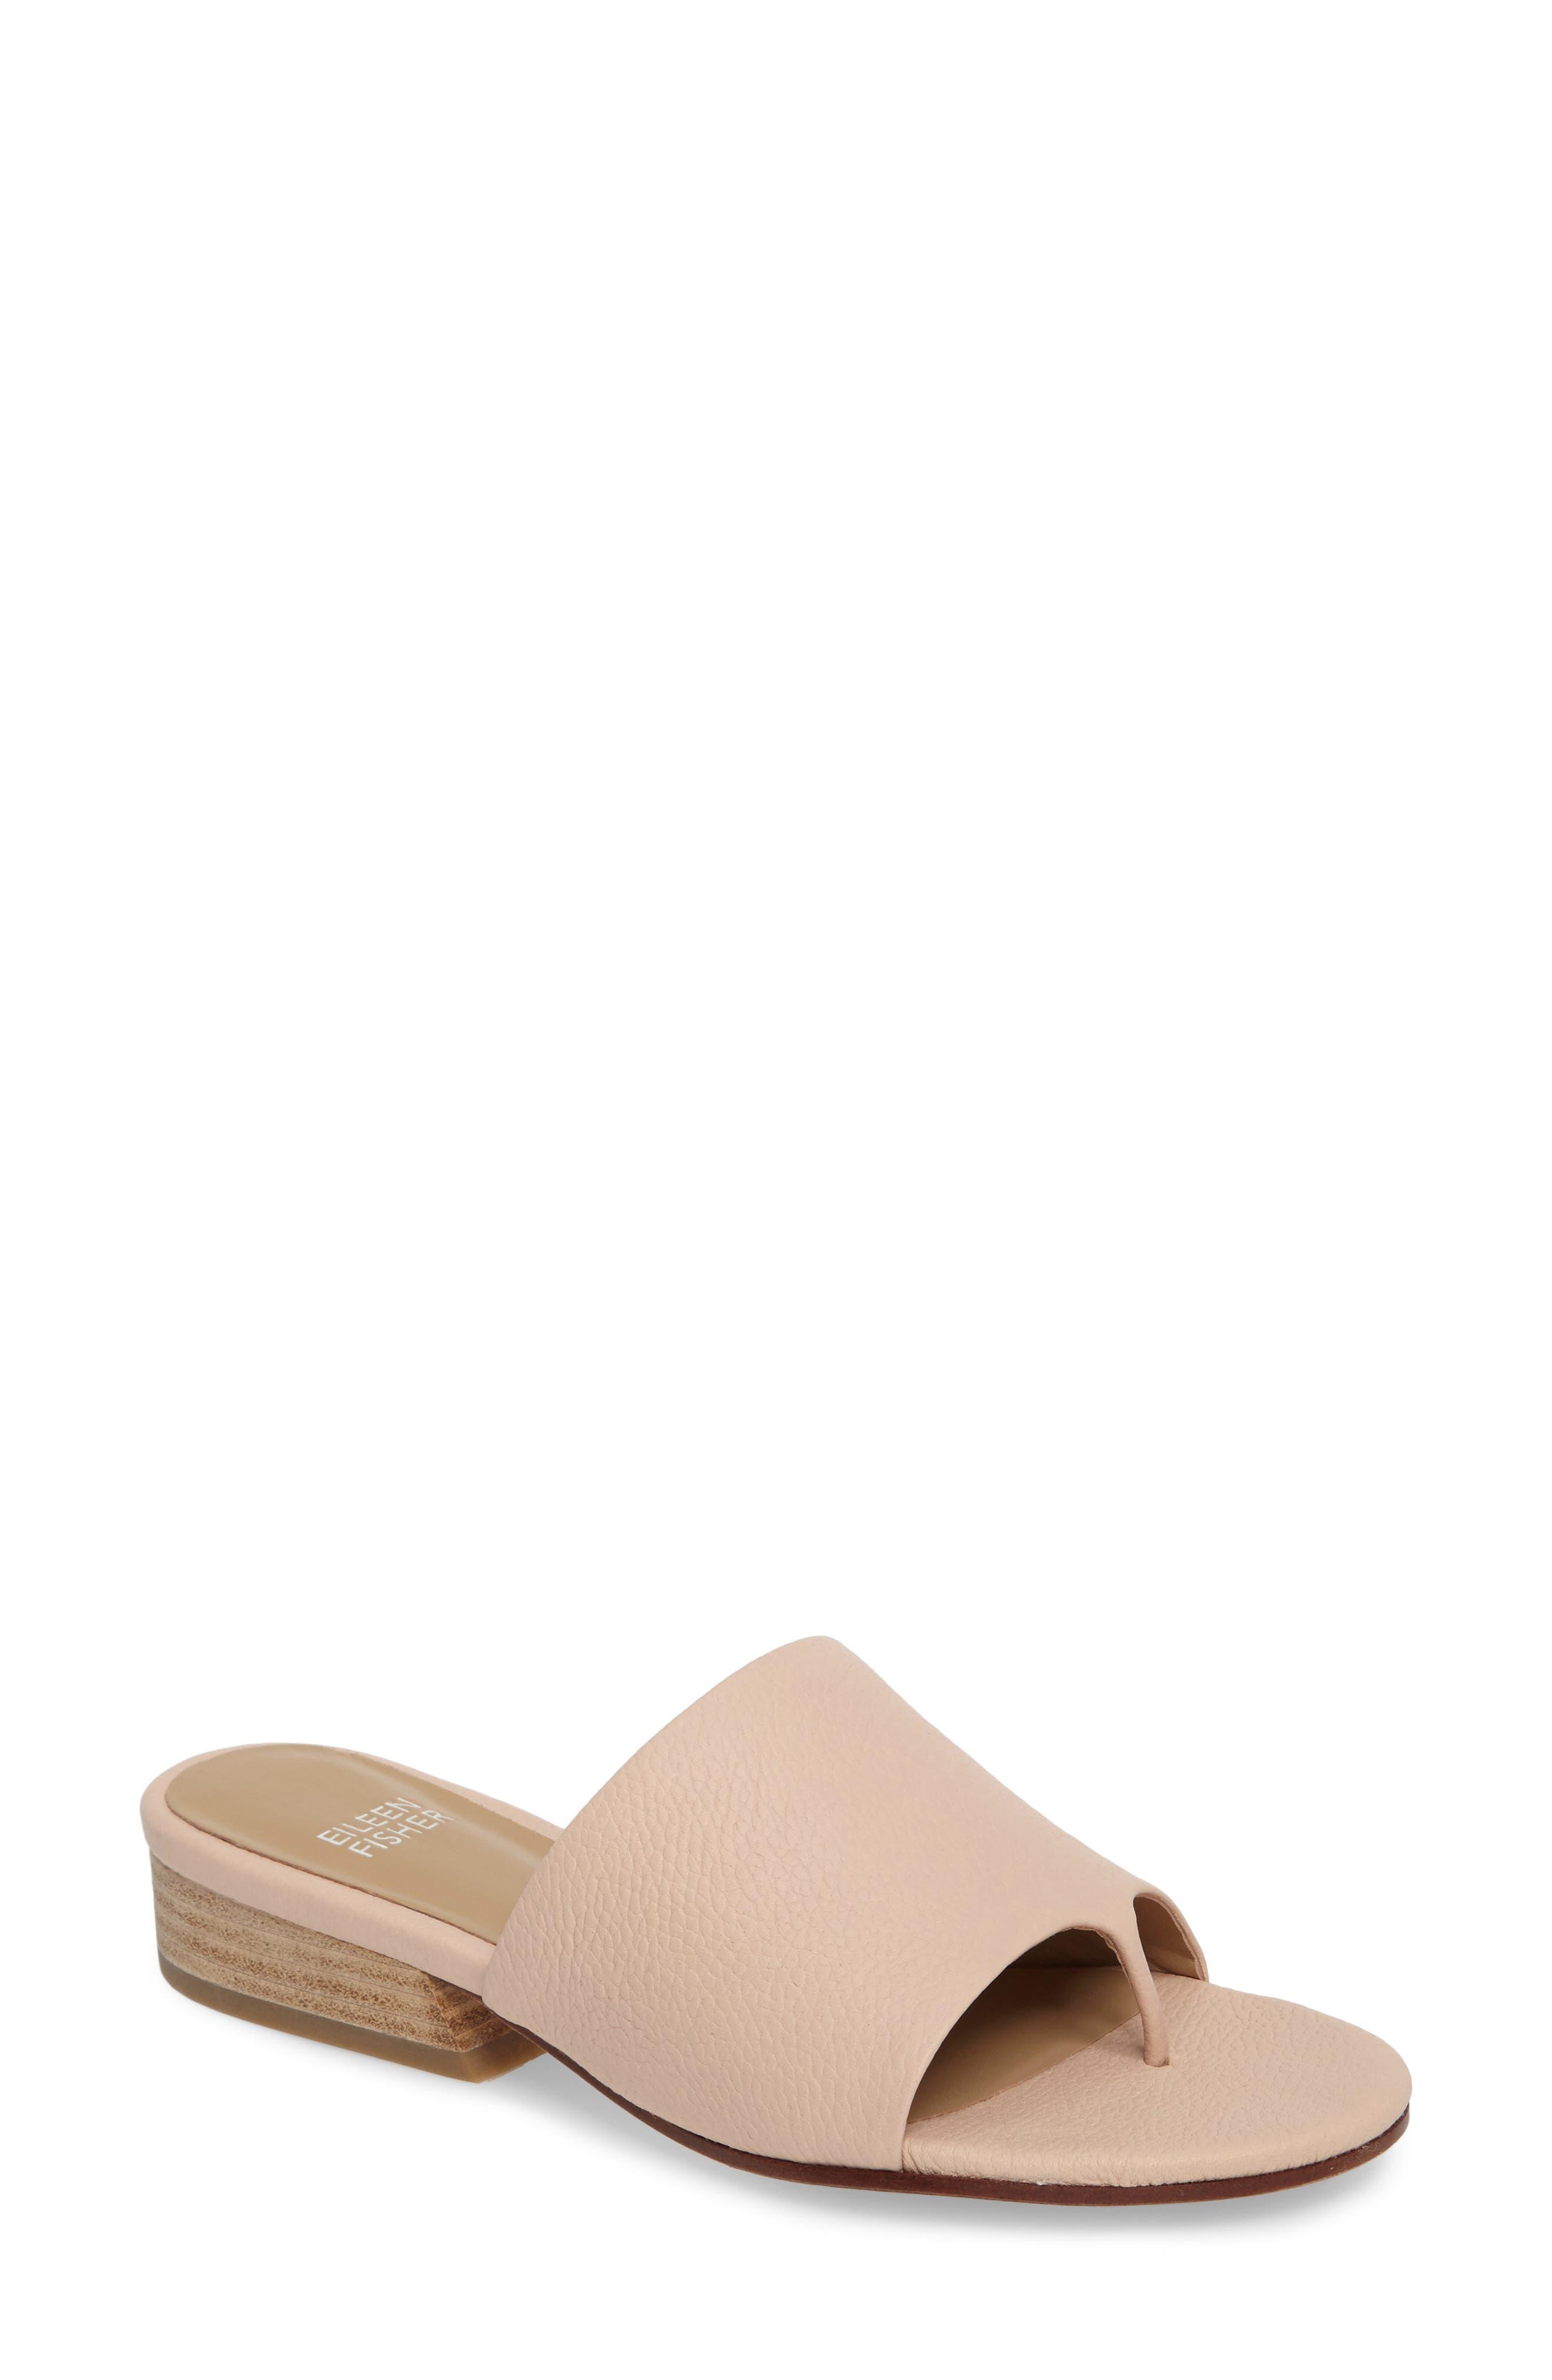 Beal Slide Sandal,                             Main thumbnail 2, color,